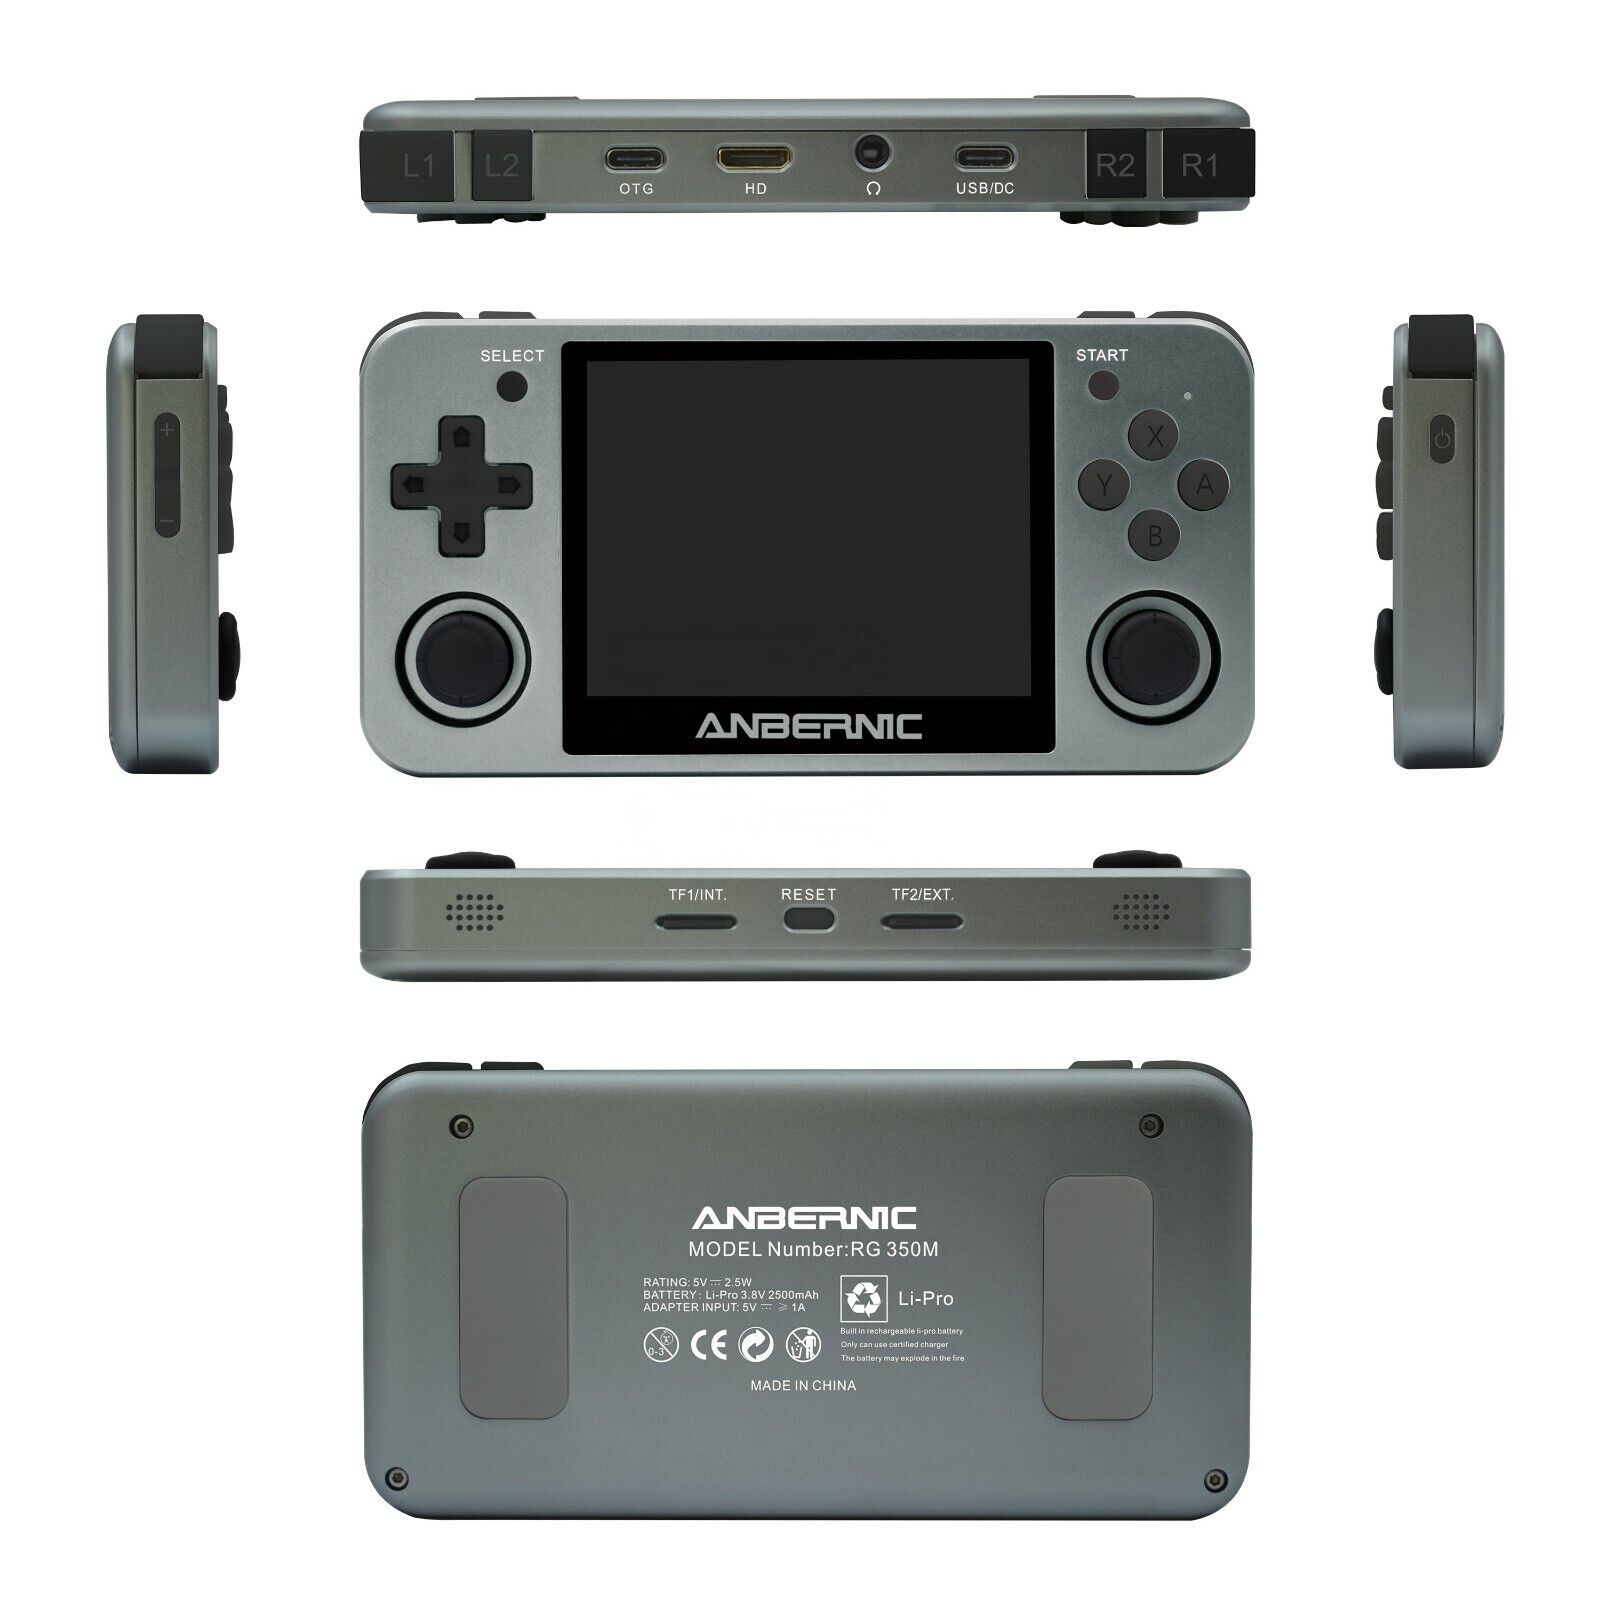 Anbernic RG350M Handheld Game Emulator - Neogeo,NES, SNES, PS1  32gb sd HDMI out